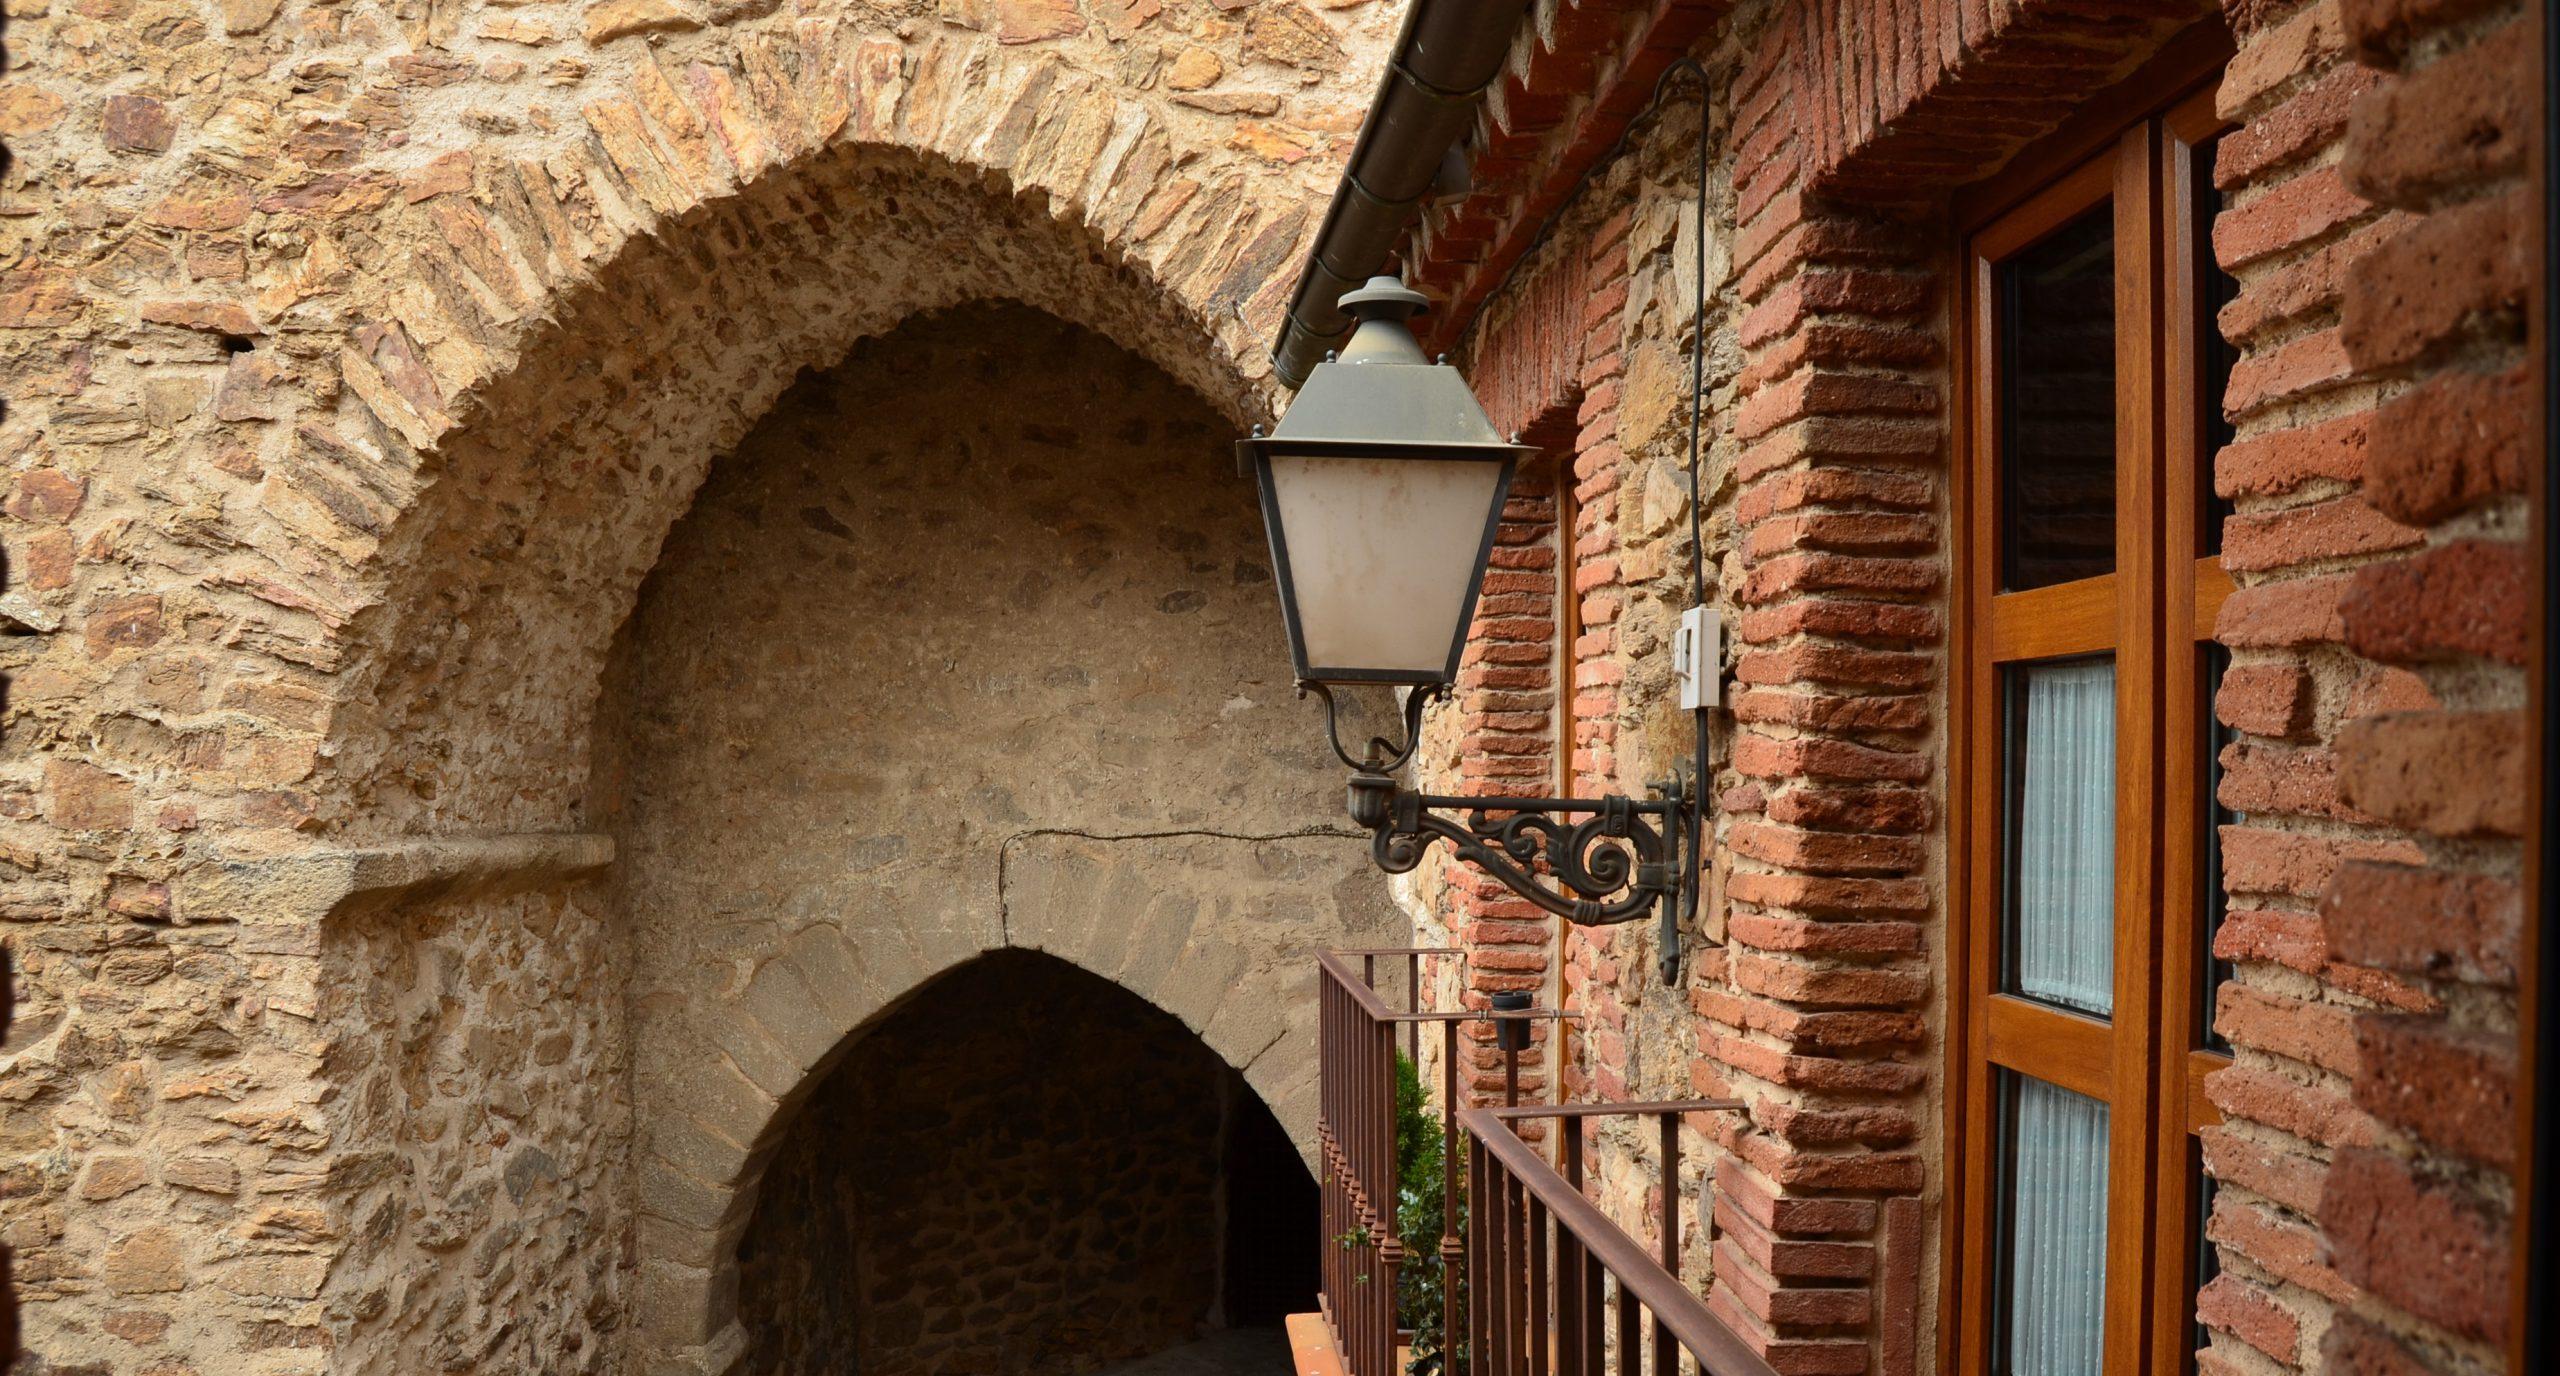 La Beltraneja Inn Muralla medieval Buitrago del Lozoya